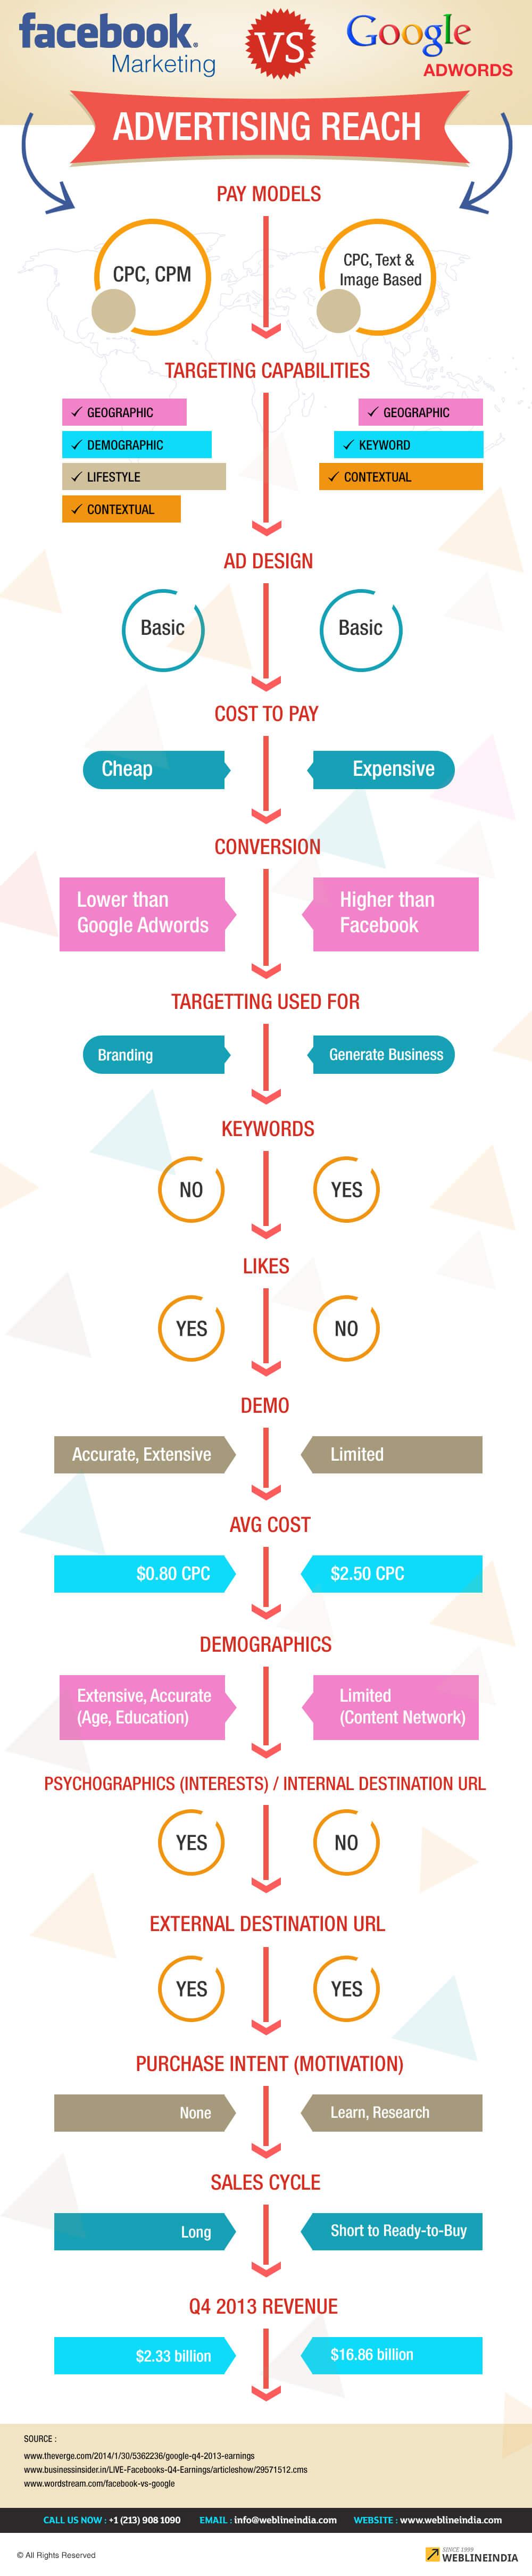 Facebook-Marketing-vs-Google-Adwords